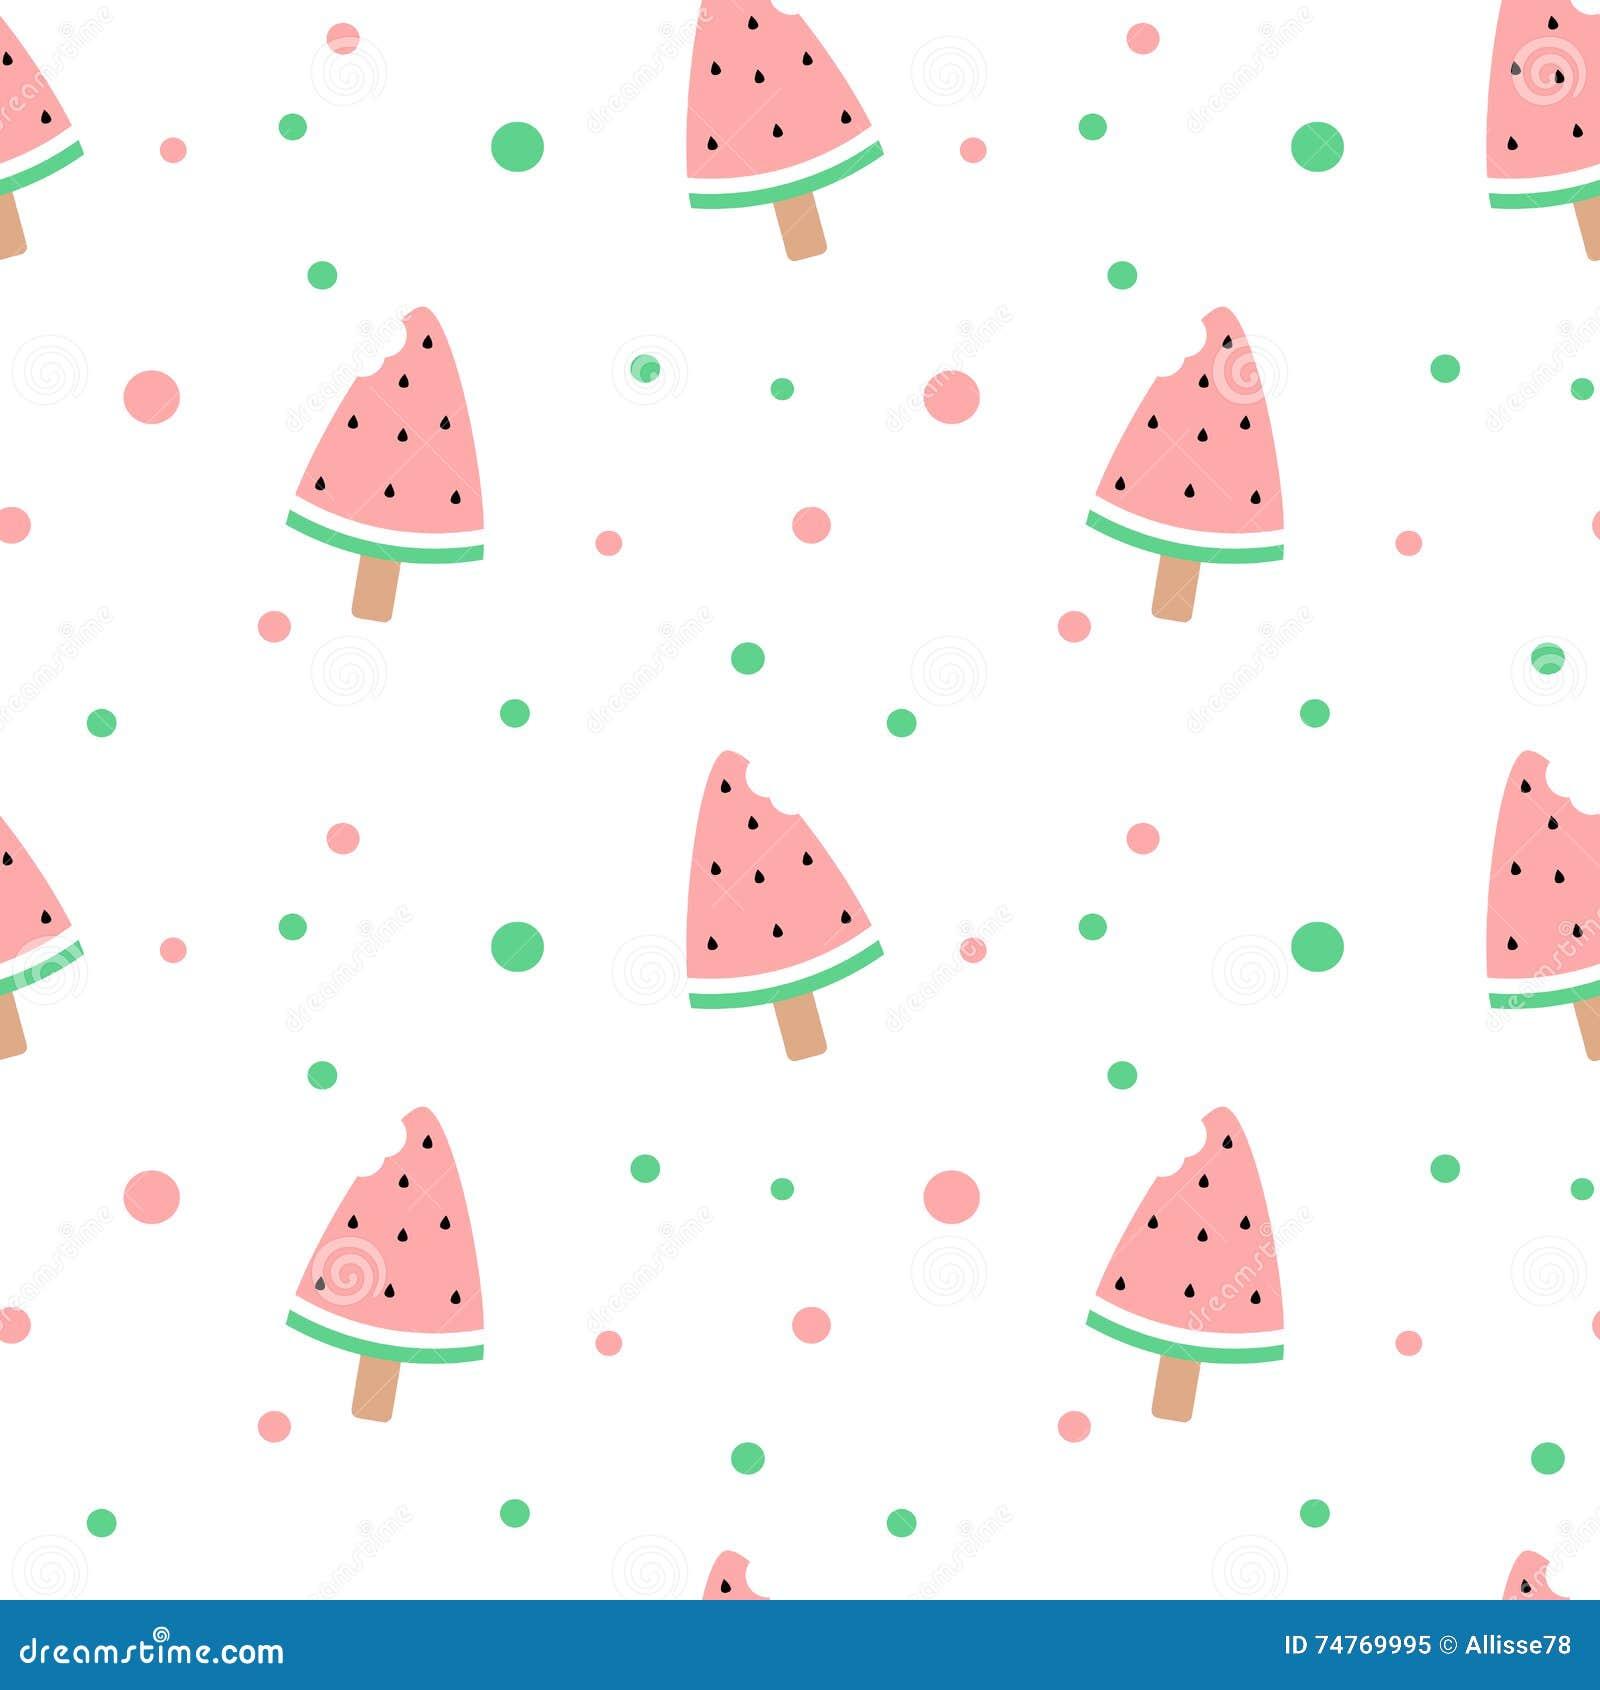 Cute Ice Cream Background: Cute Watermelon Bitten Ice Cream Seamless Pattern